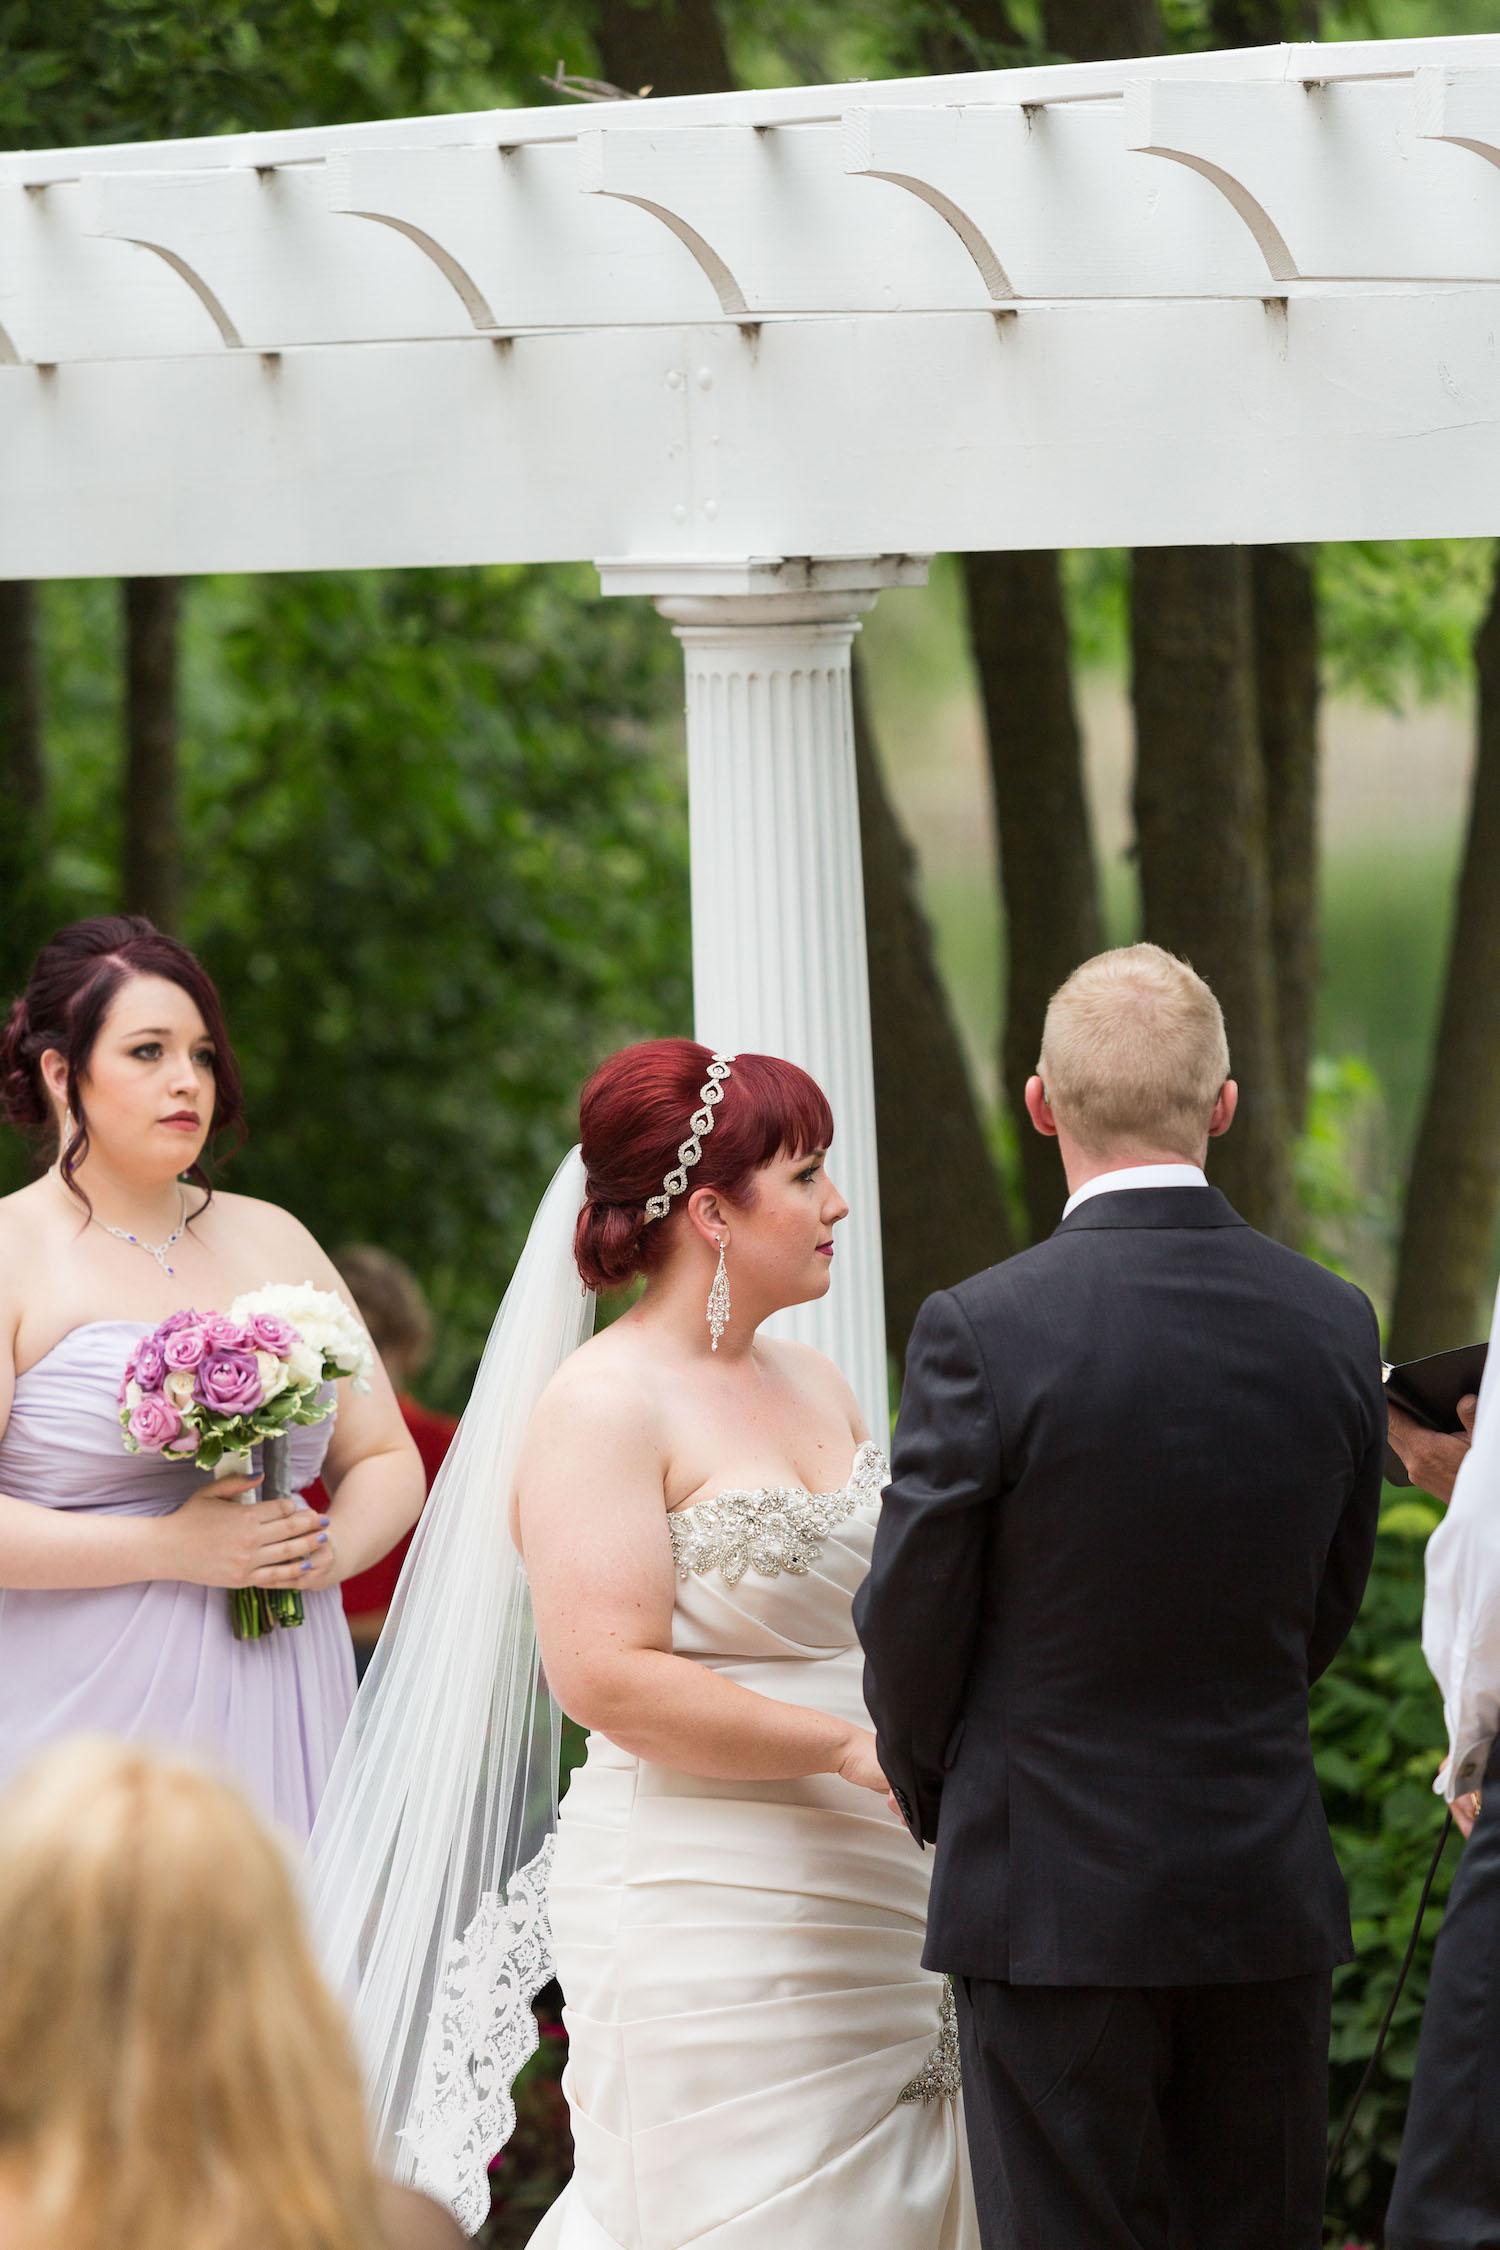 Cindyrella's Garden outdoor ceremony by the lake with a redhead bride, lavender bridesmaids